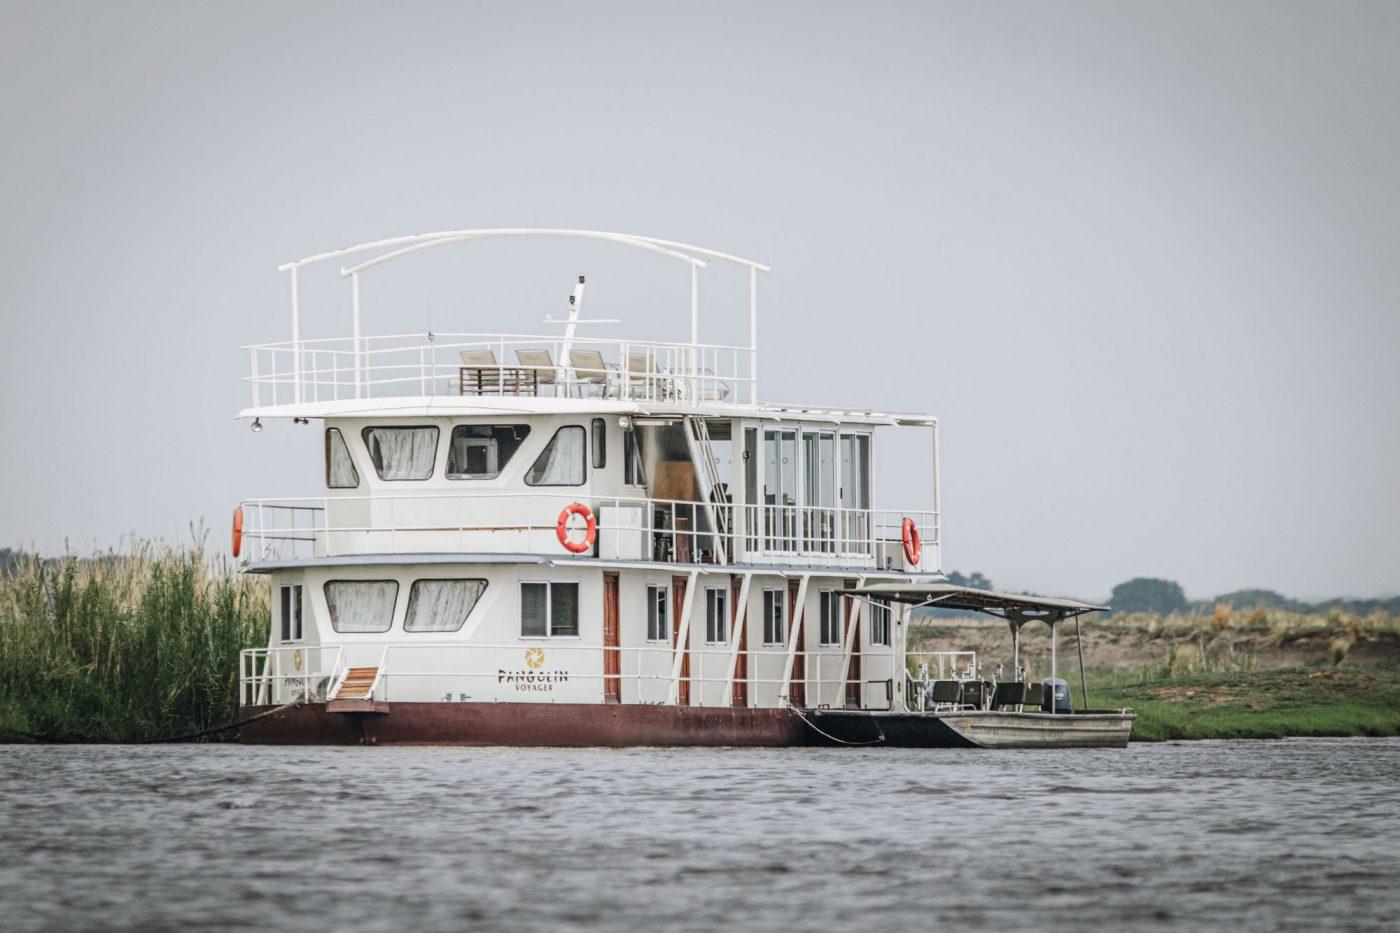 Pangolin Voyager houseboat on Chobe River, chobe national park botswana